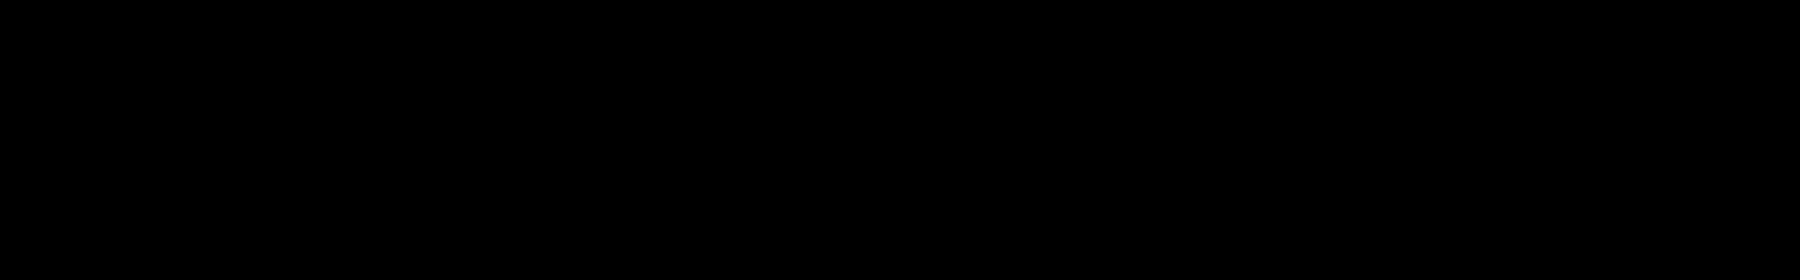 Velvet - Dancehall Trap audio waveform